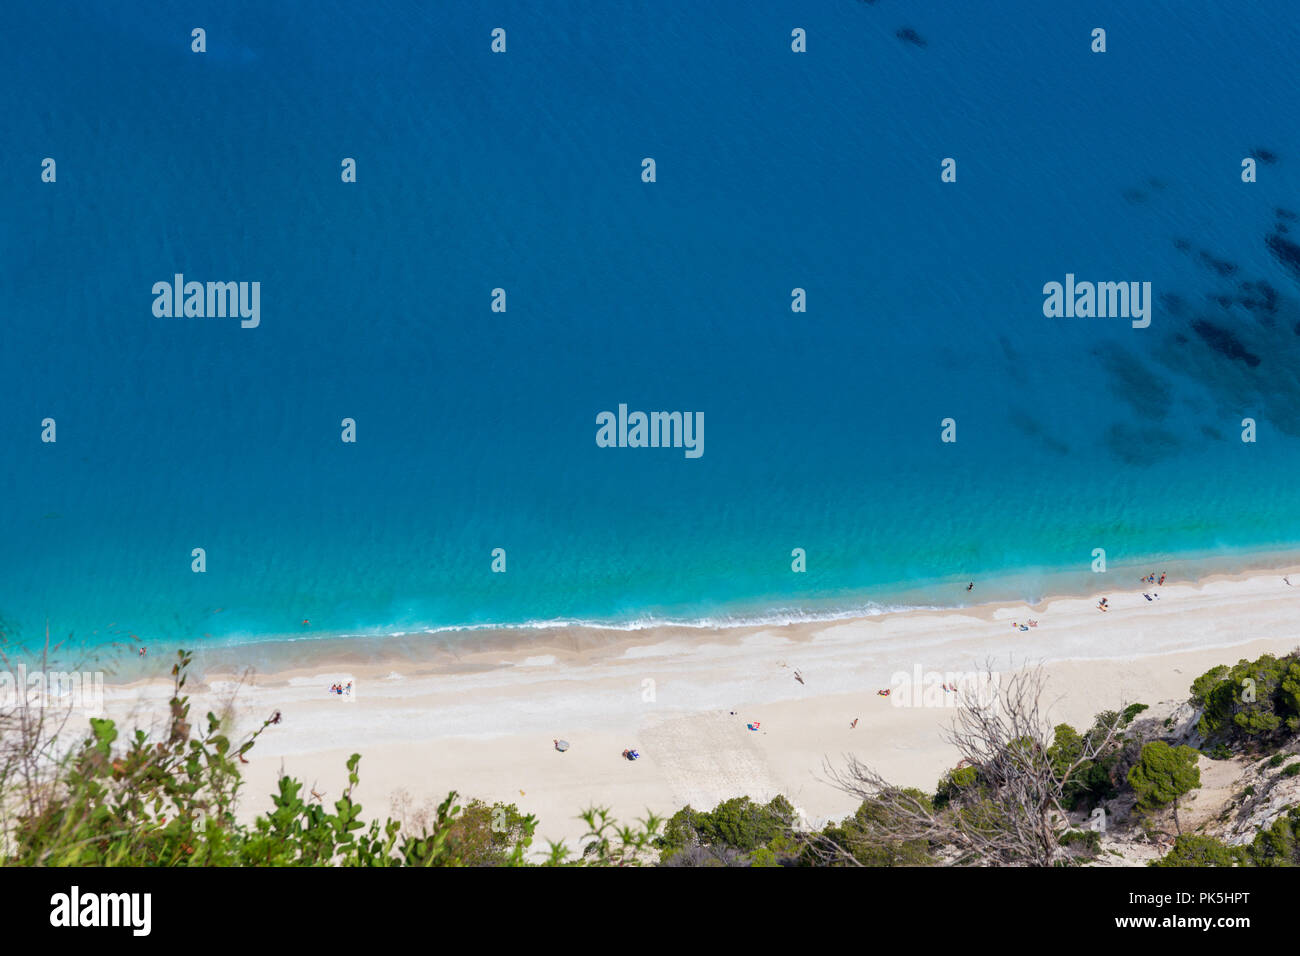 Bird eye view of the shoreline of Egremni beach, Lefkada, Greece - Stock Image